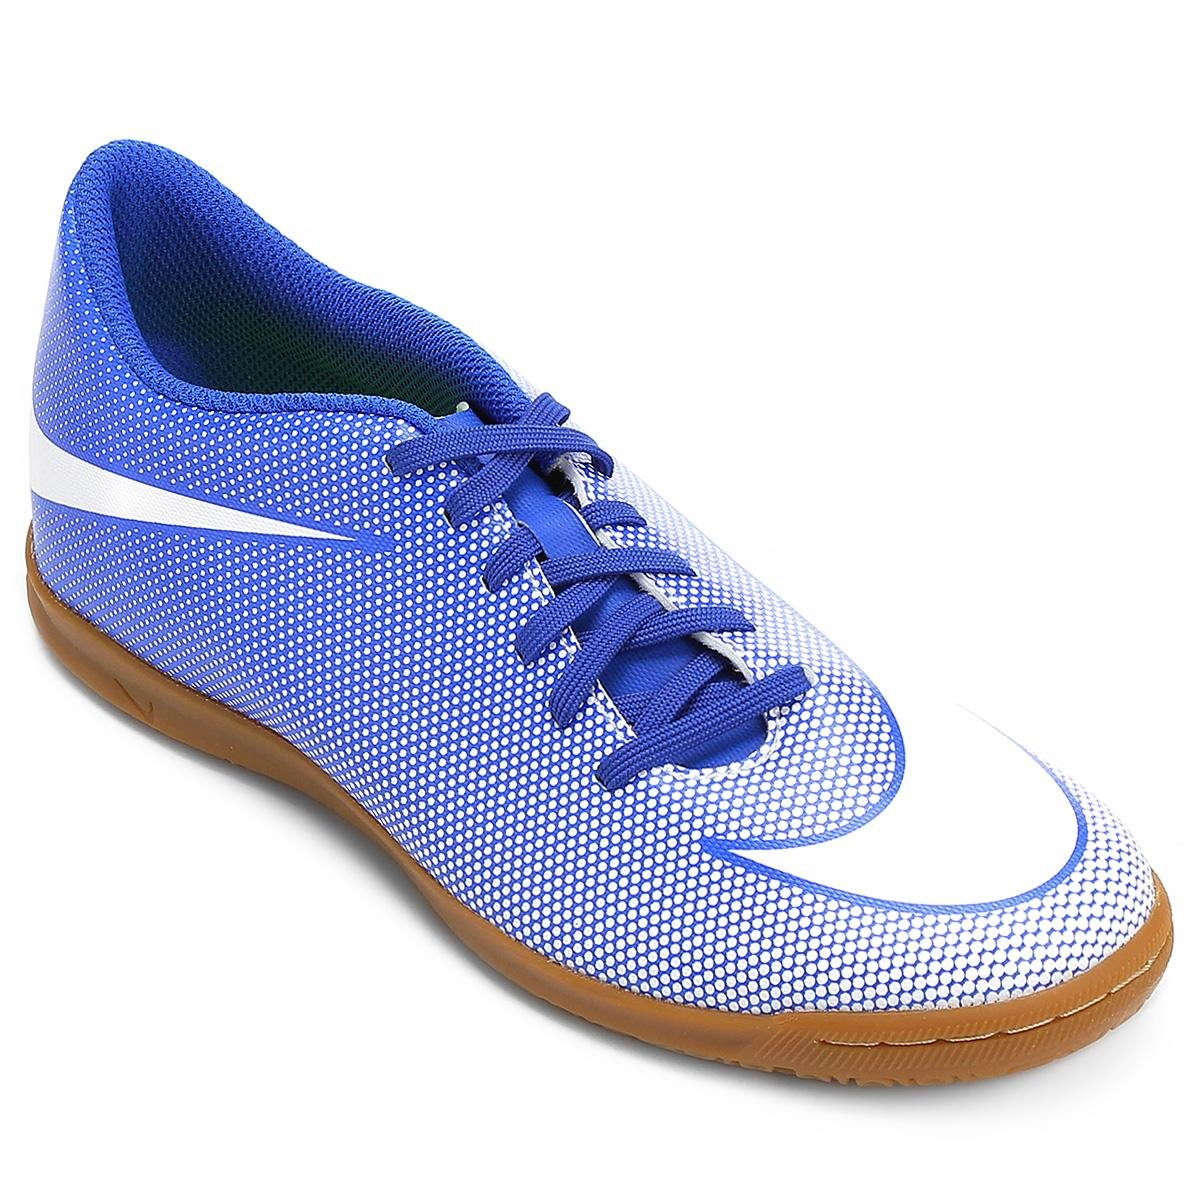 3d8a13d277 Chuteira Futsal Nike Bravata 2 IC - Azul e Branco - Compre Agora ...